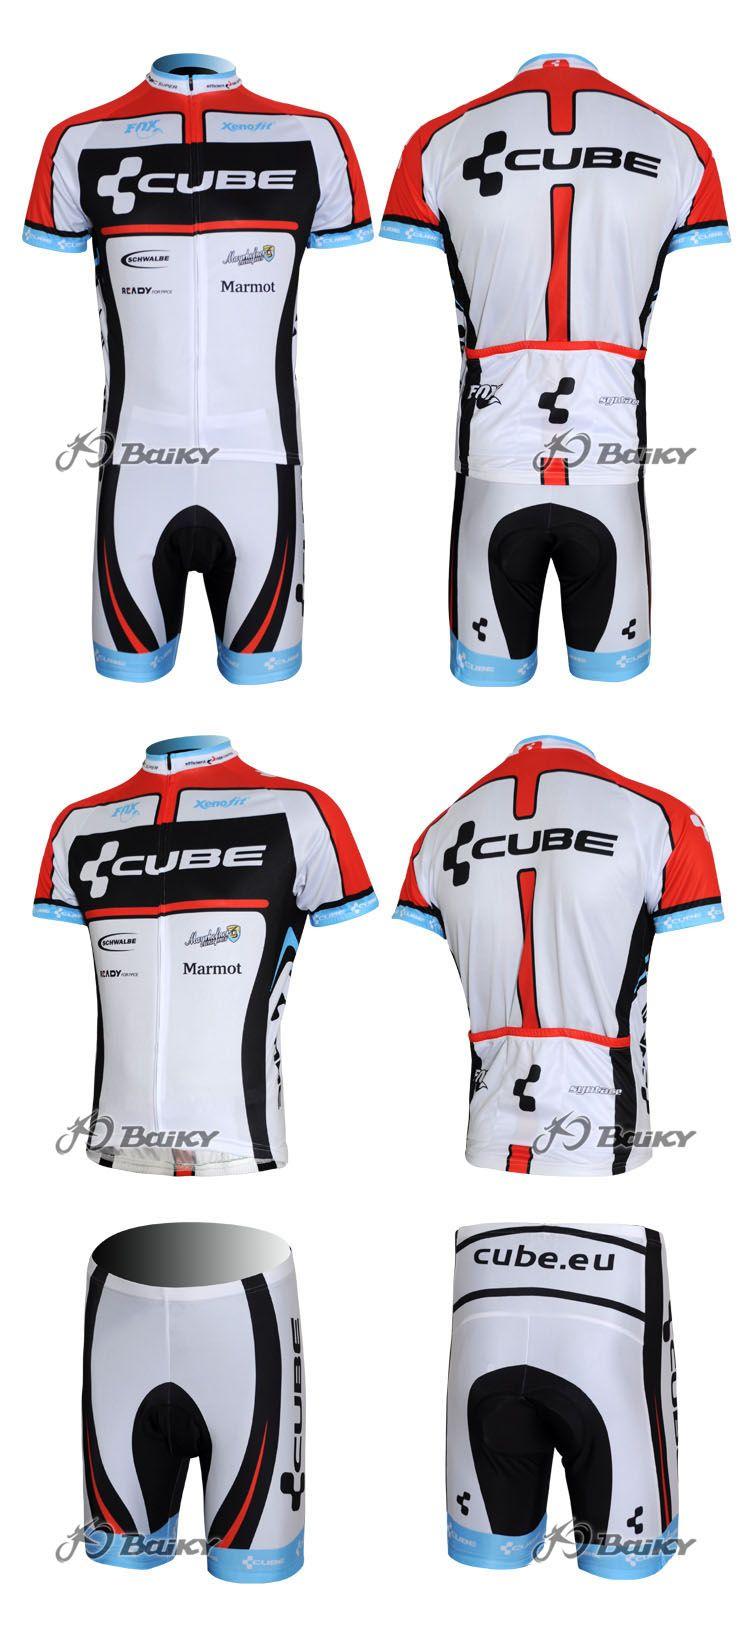 2012 Cube Black White Cycling Wear Short Sleeve Cycling Jersey + Short Set Maat: XS-4XL C043